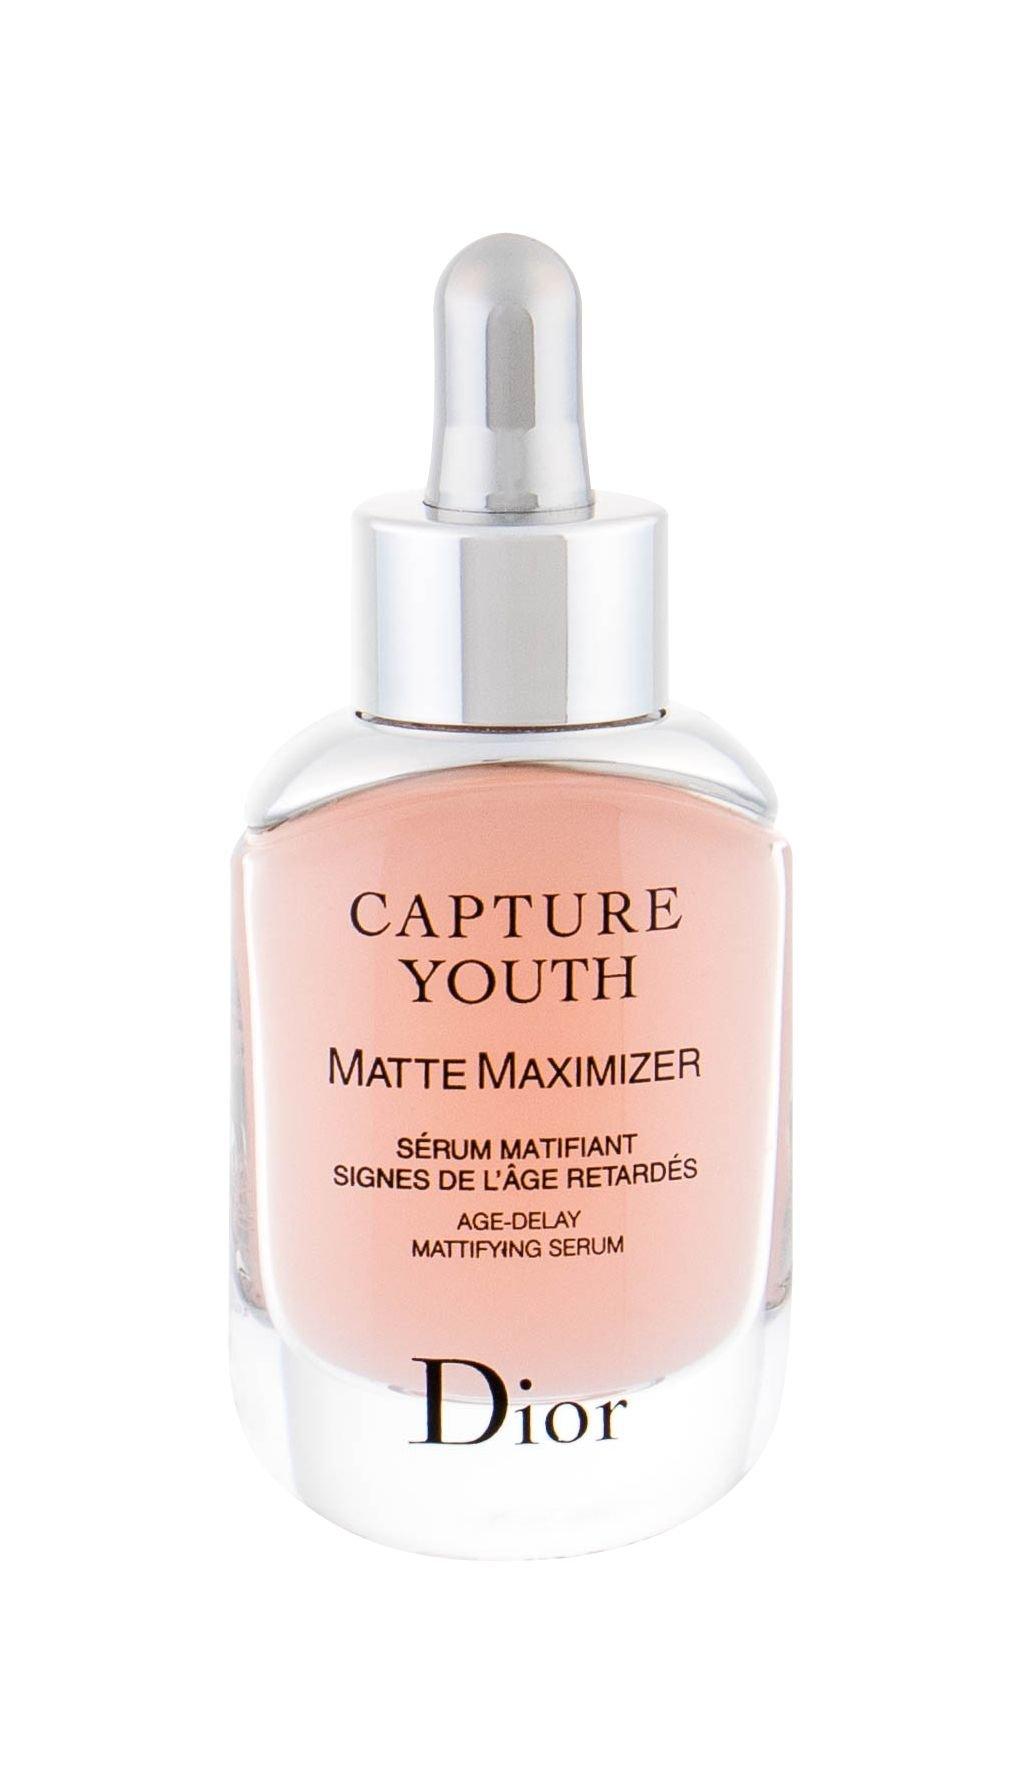 Christian Dior Capture Youth Skin Serum 30ml